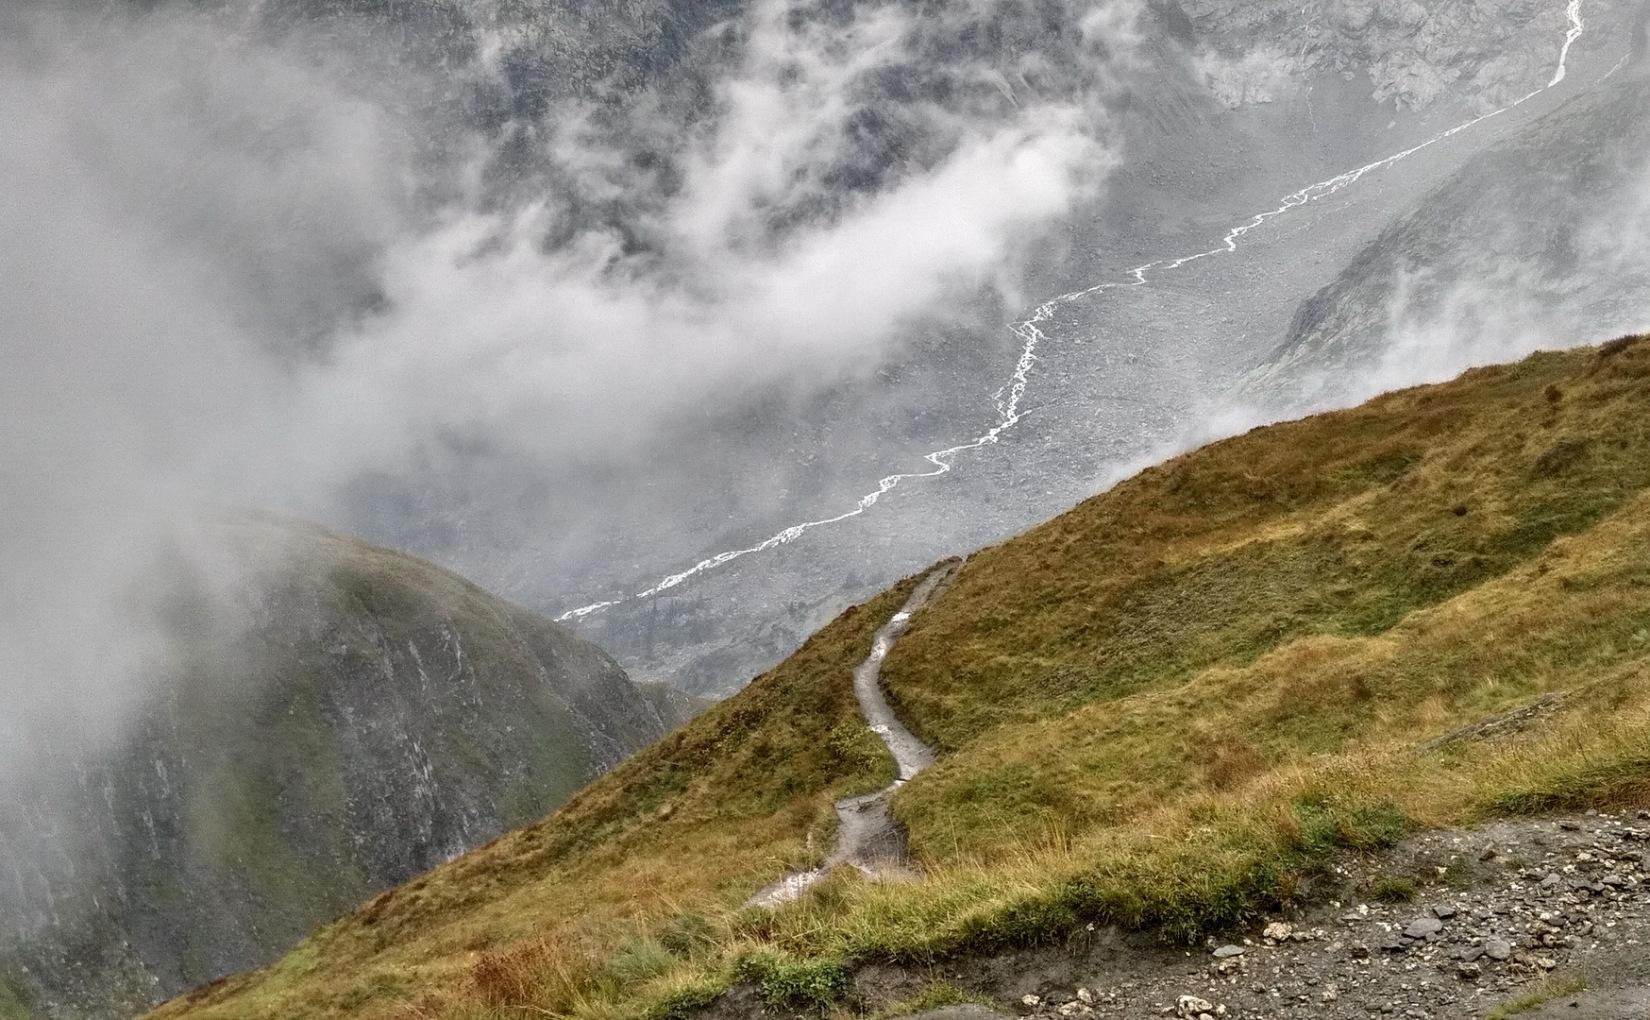 MT 10.3 Ferret > Grand Col Ferret > Rifugio Walter Bonatti (Wallis, Aosta, TMB)